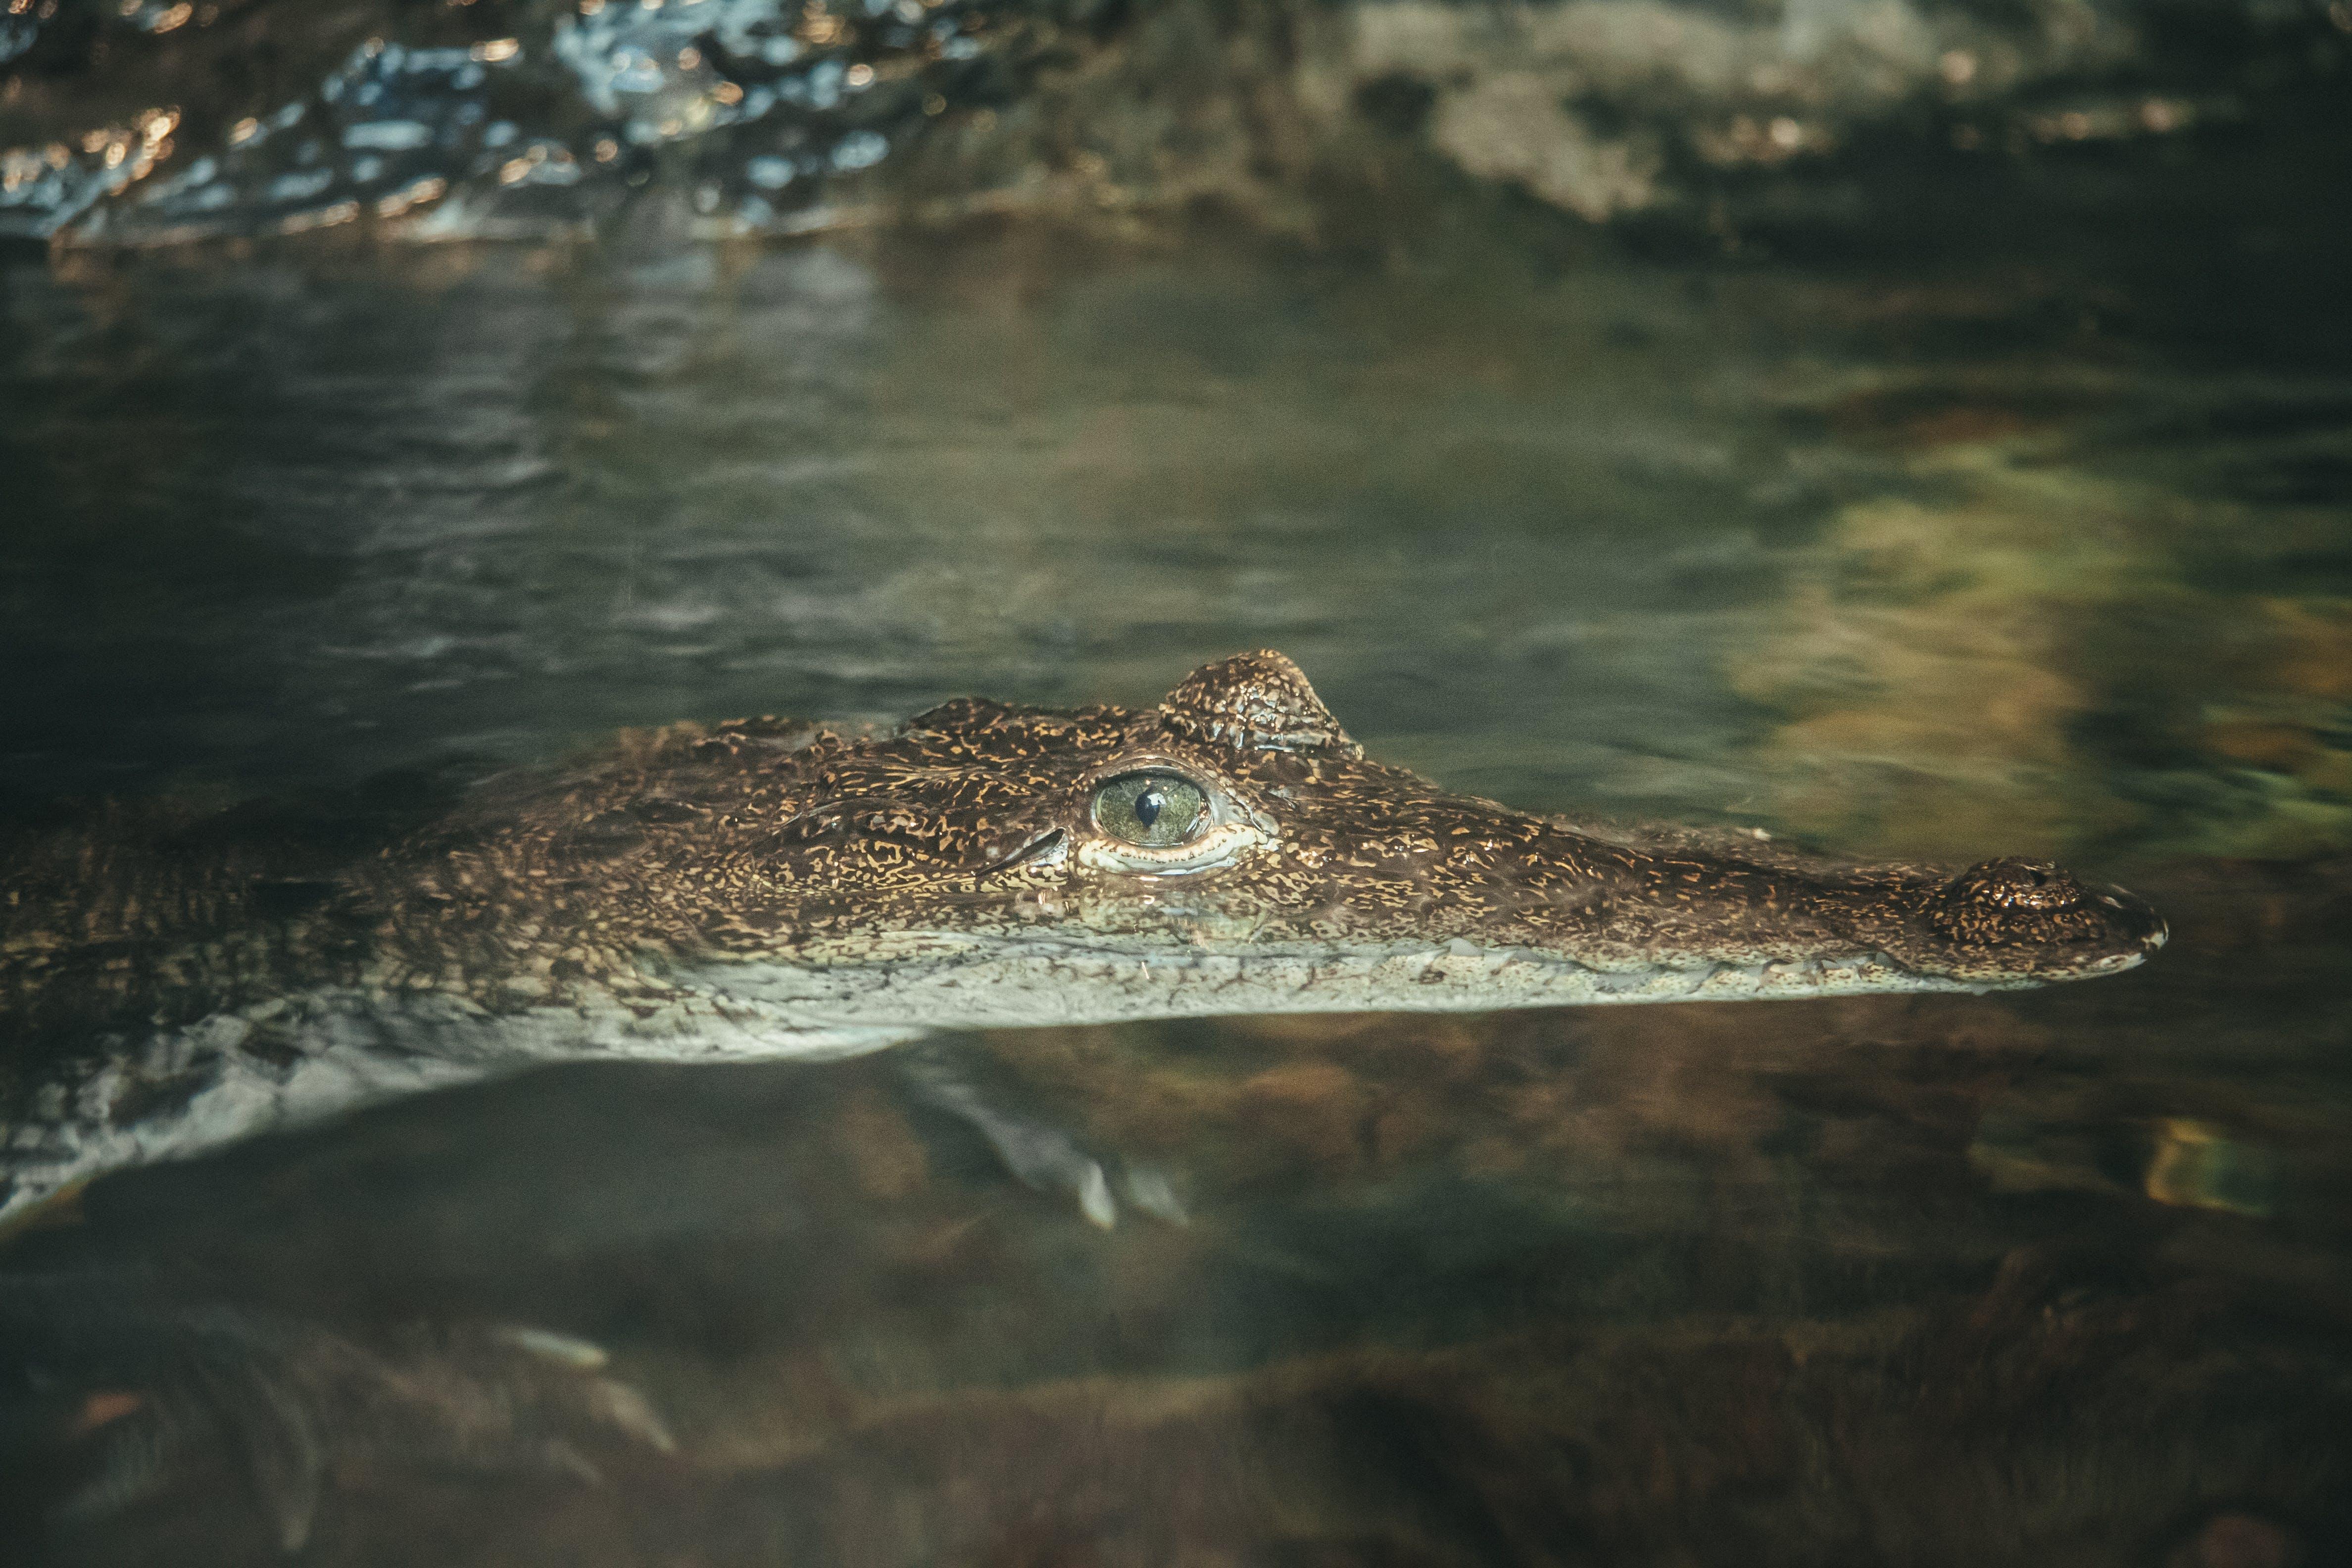 Brown Alligator